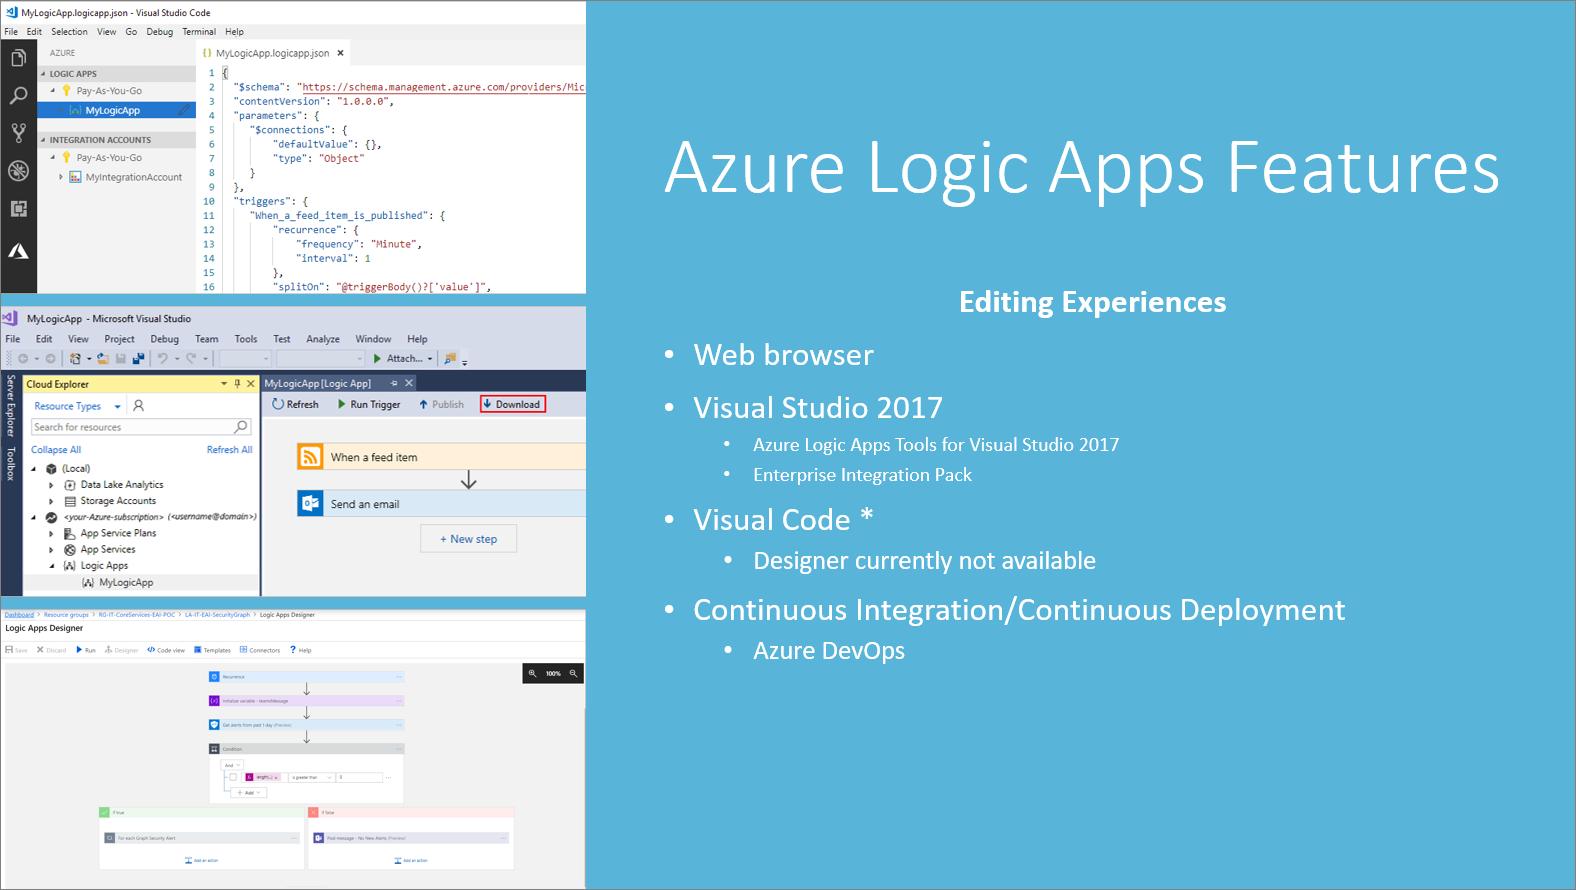 Azure Logic Apps features